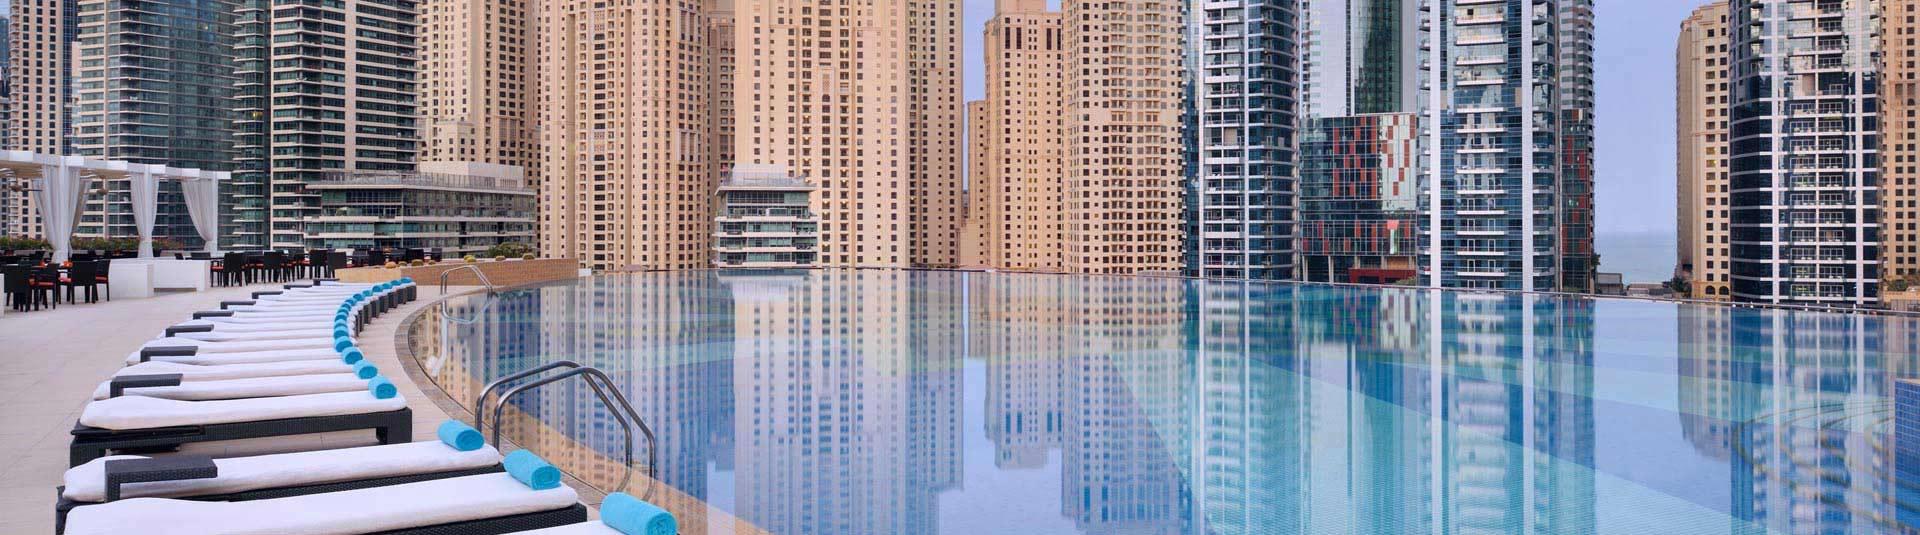 TADMM-Pool-Banner_tcm113-63380.jpg